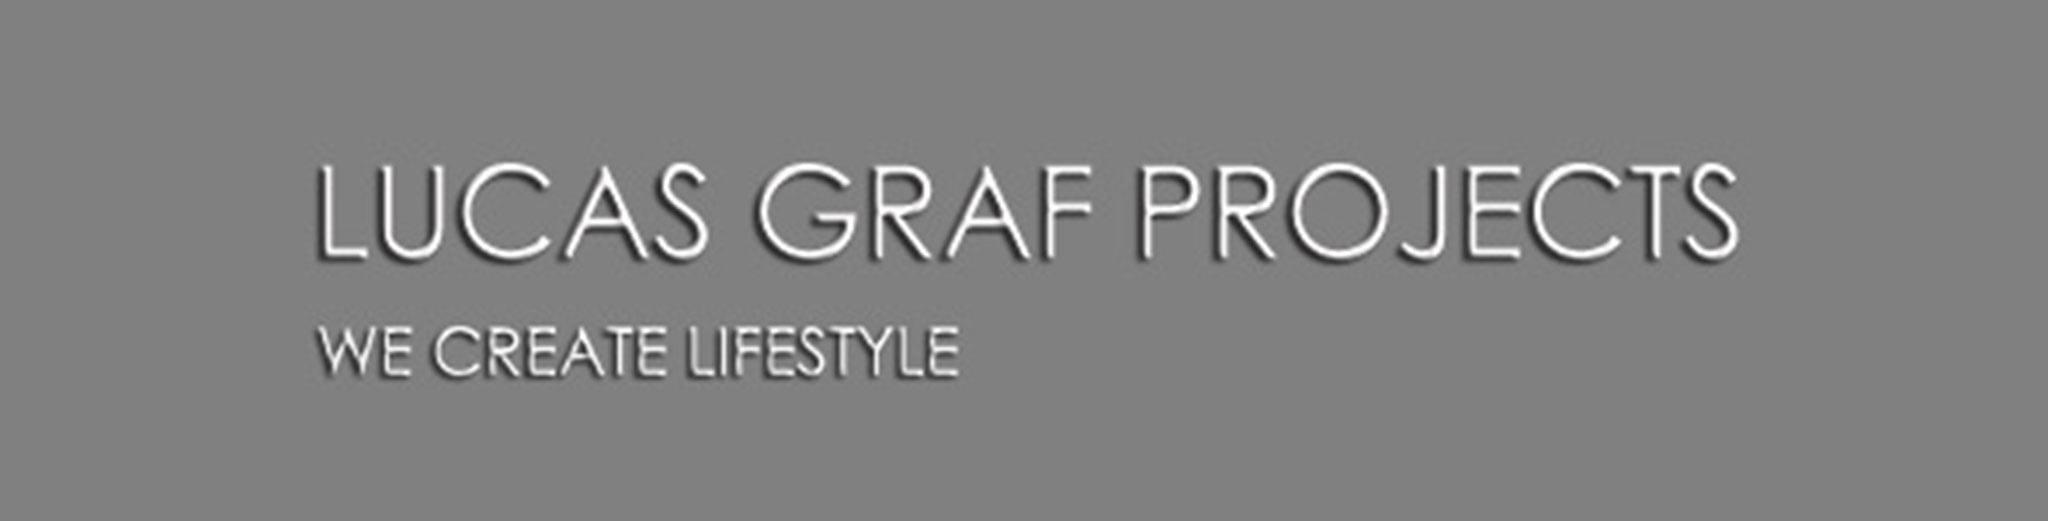 Logotipo de Lucas Graf Projects